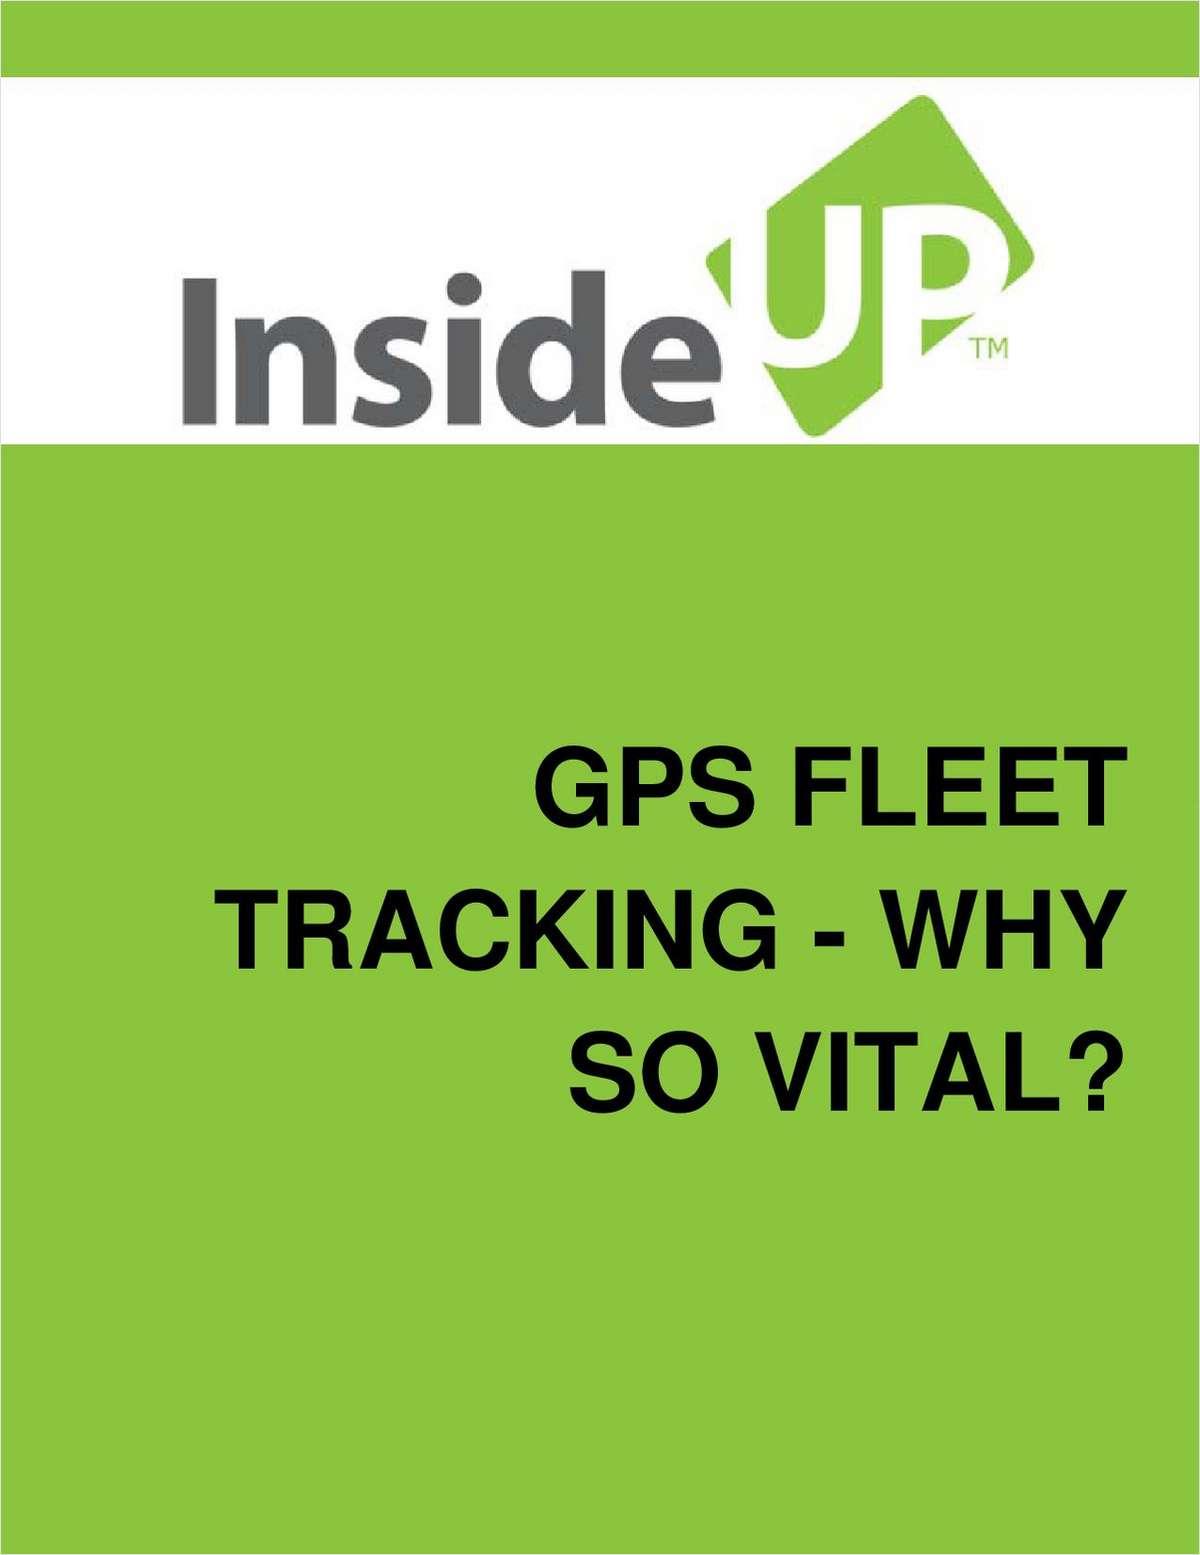 GPS Fleet Tracking - Why So Vital?